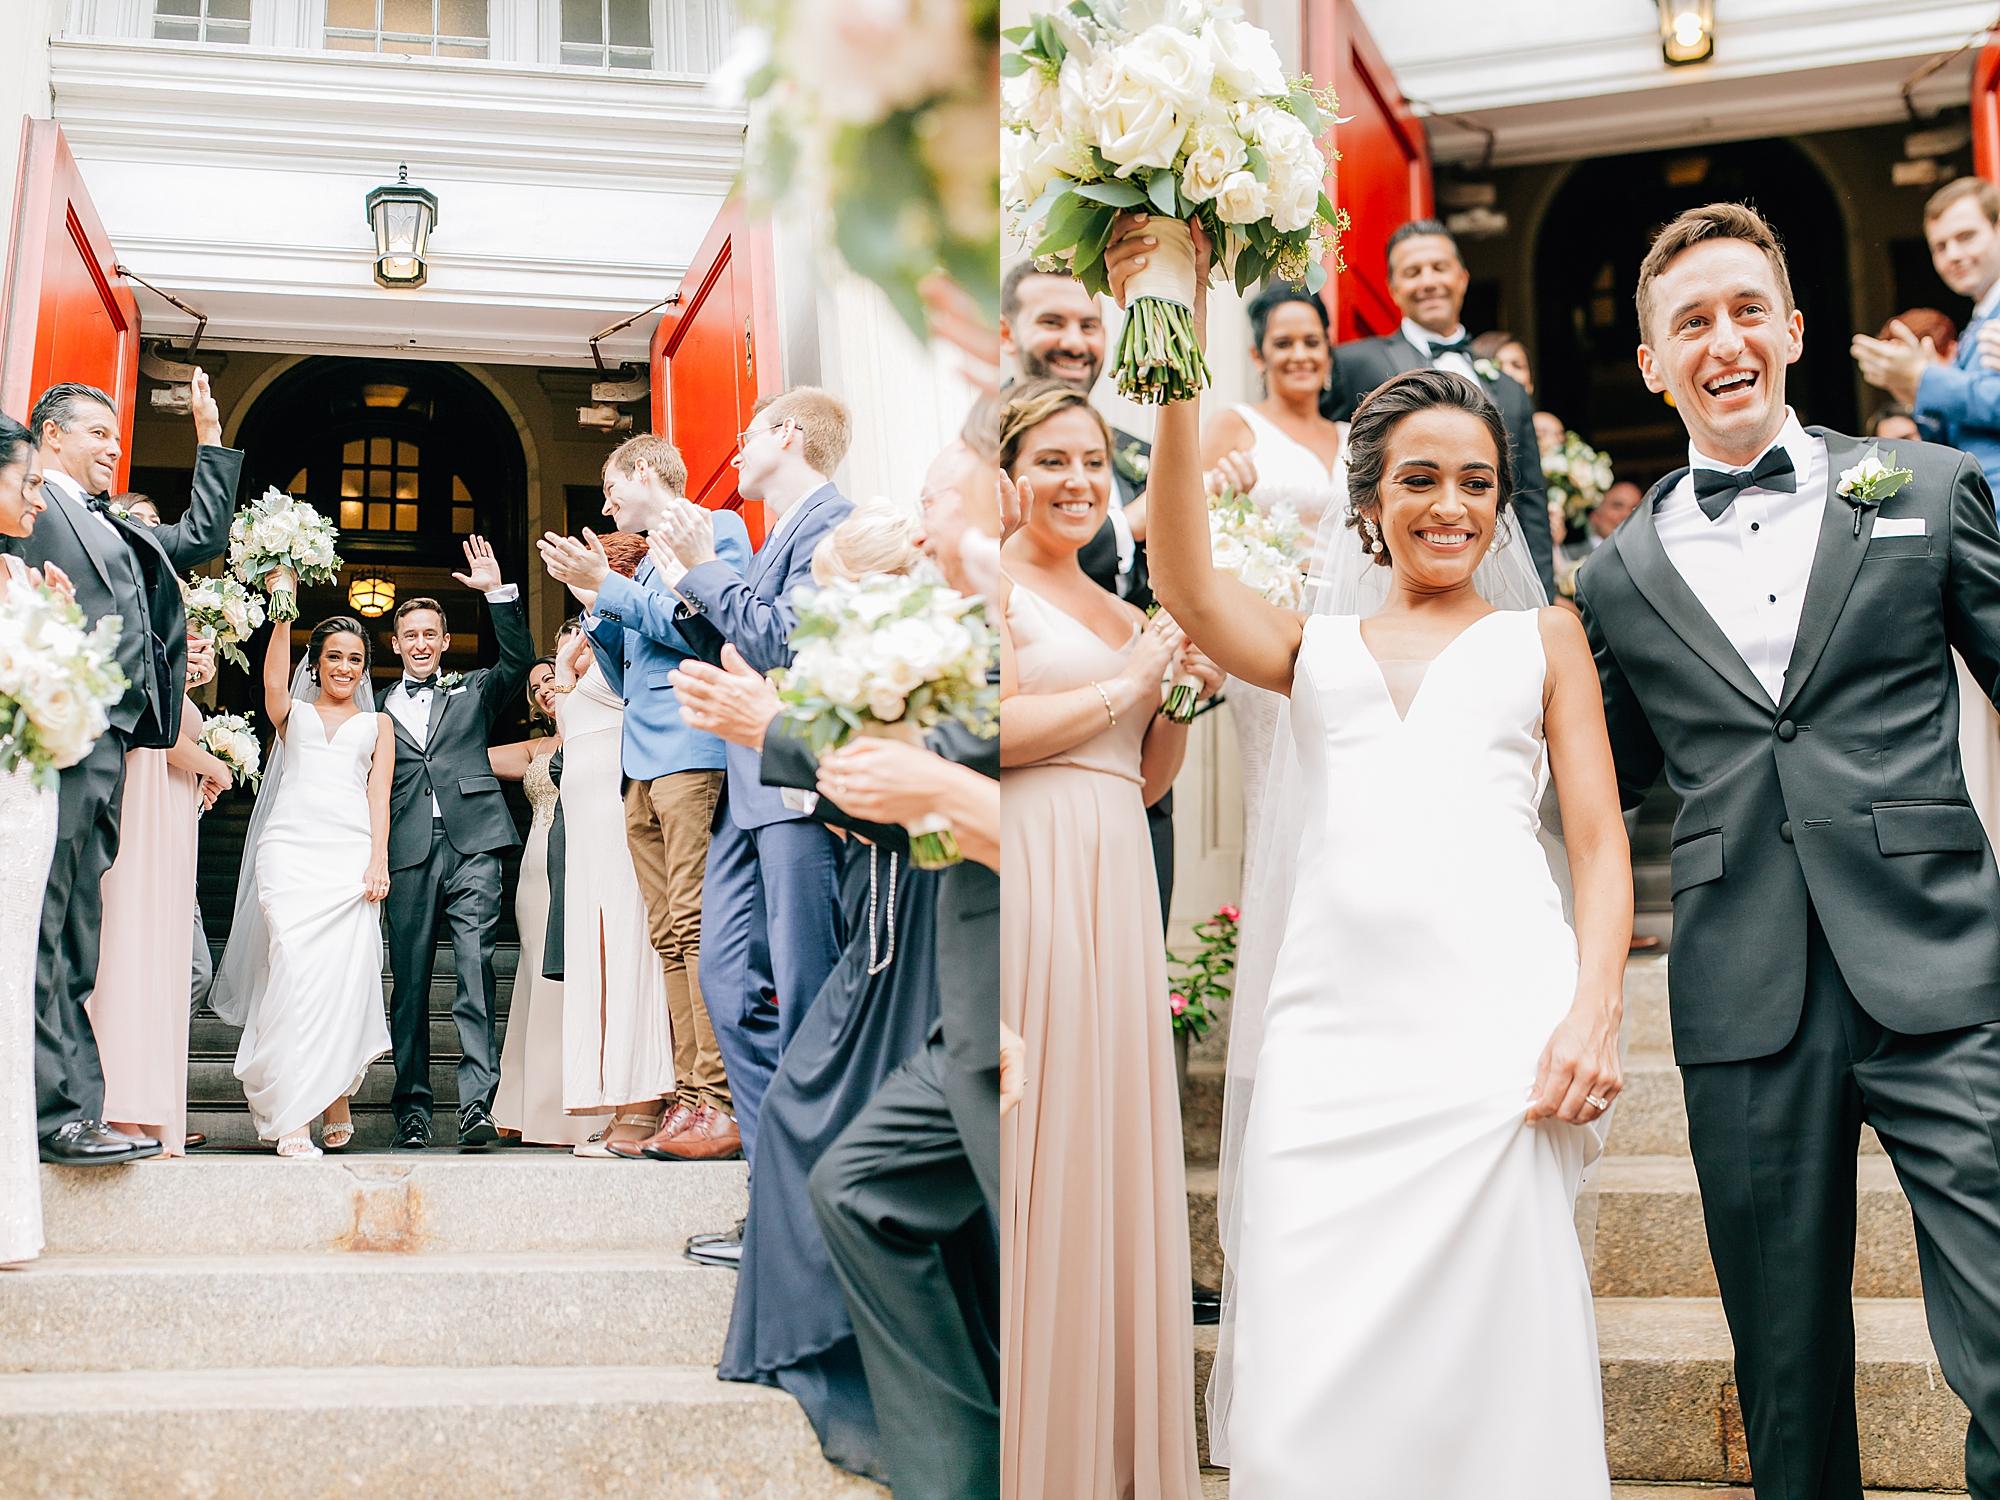 Cescaphe Philadelphia Film Wedding Photography by Magdalena Studios 21